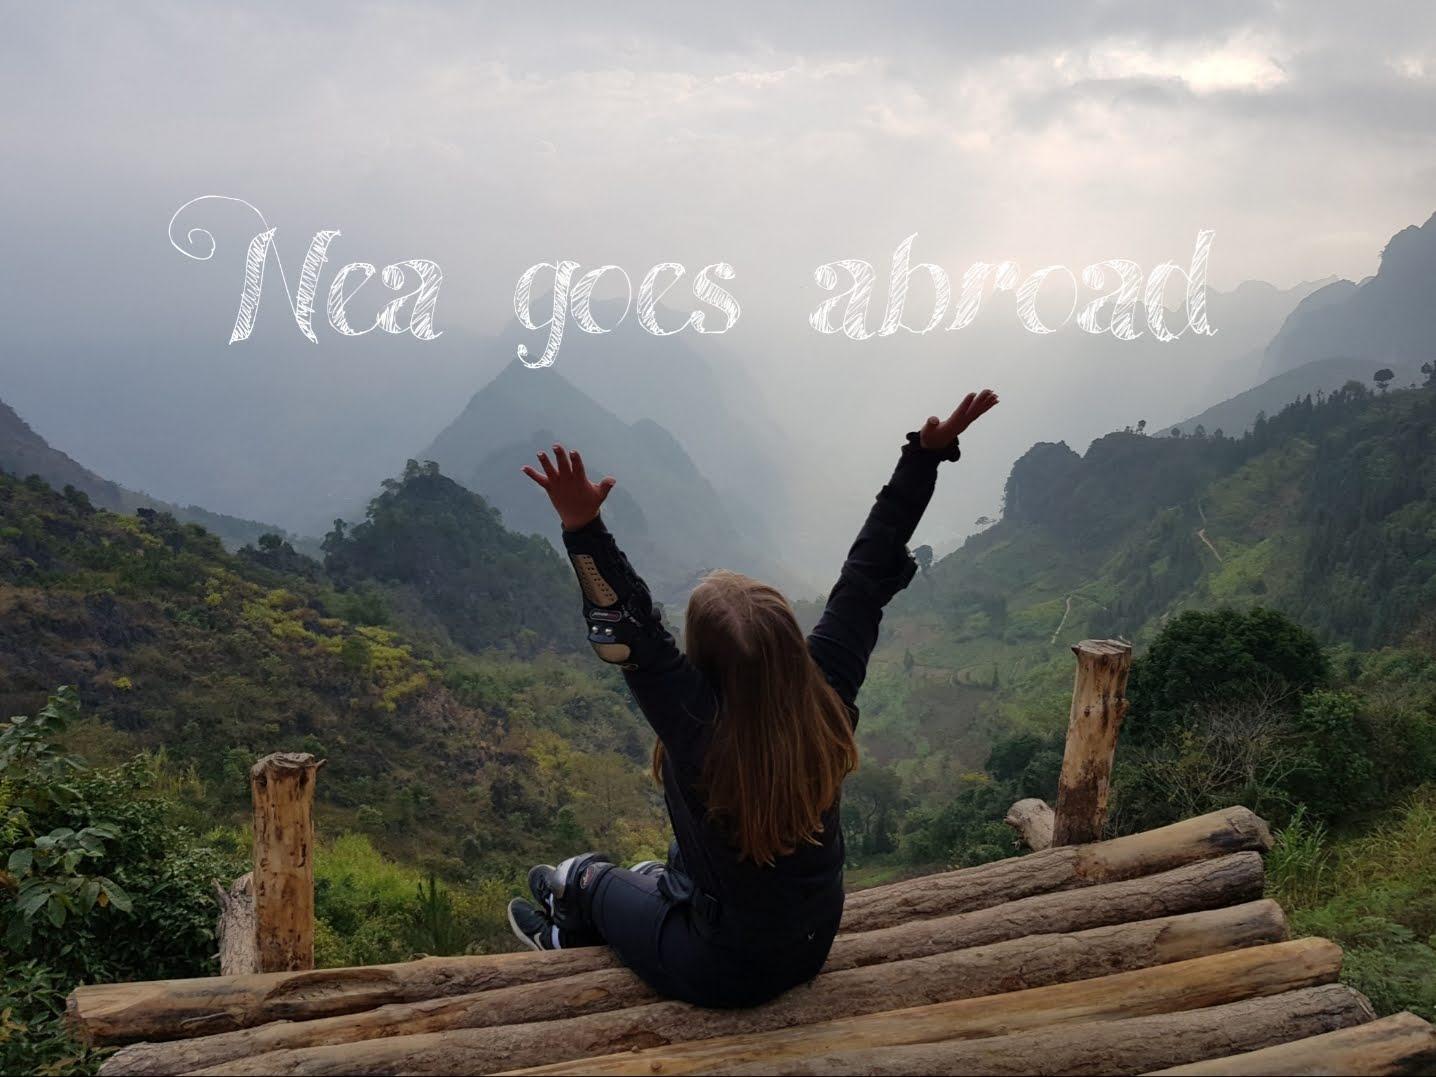 Nea goes abroad